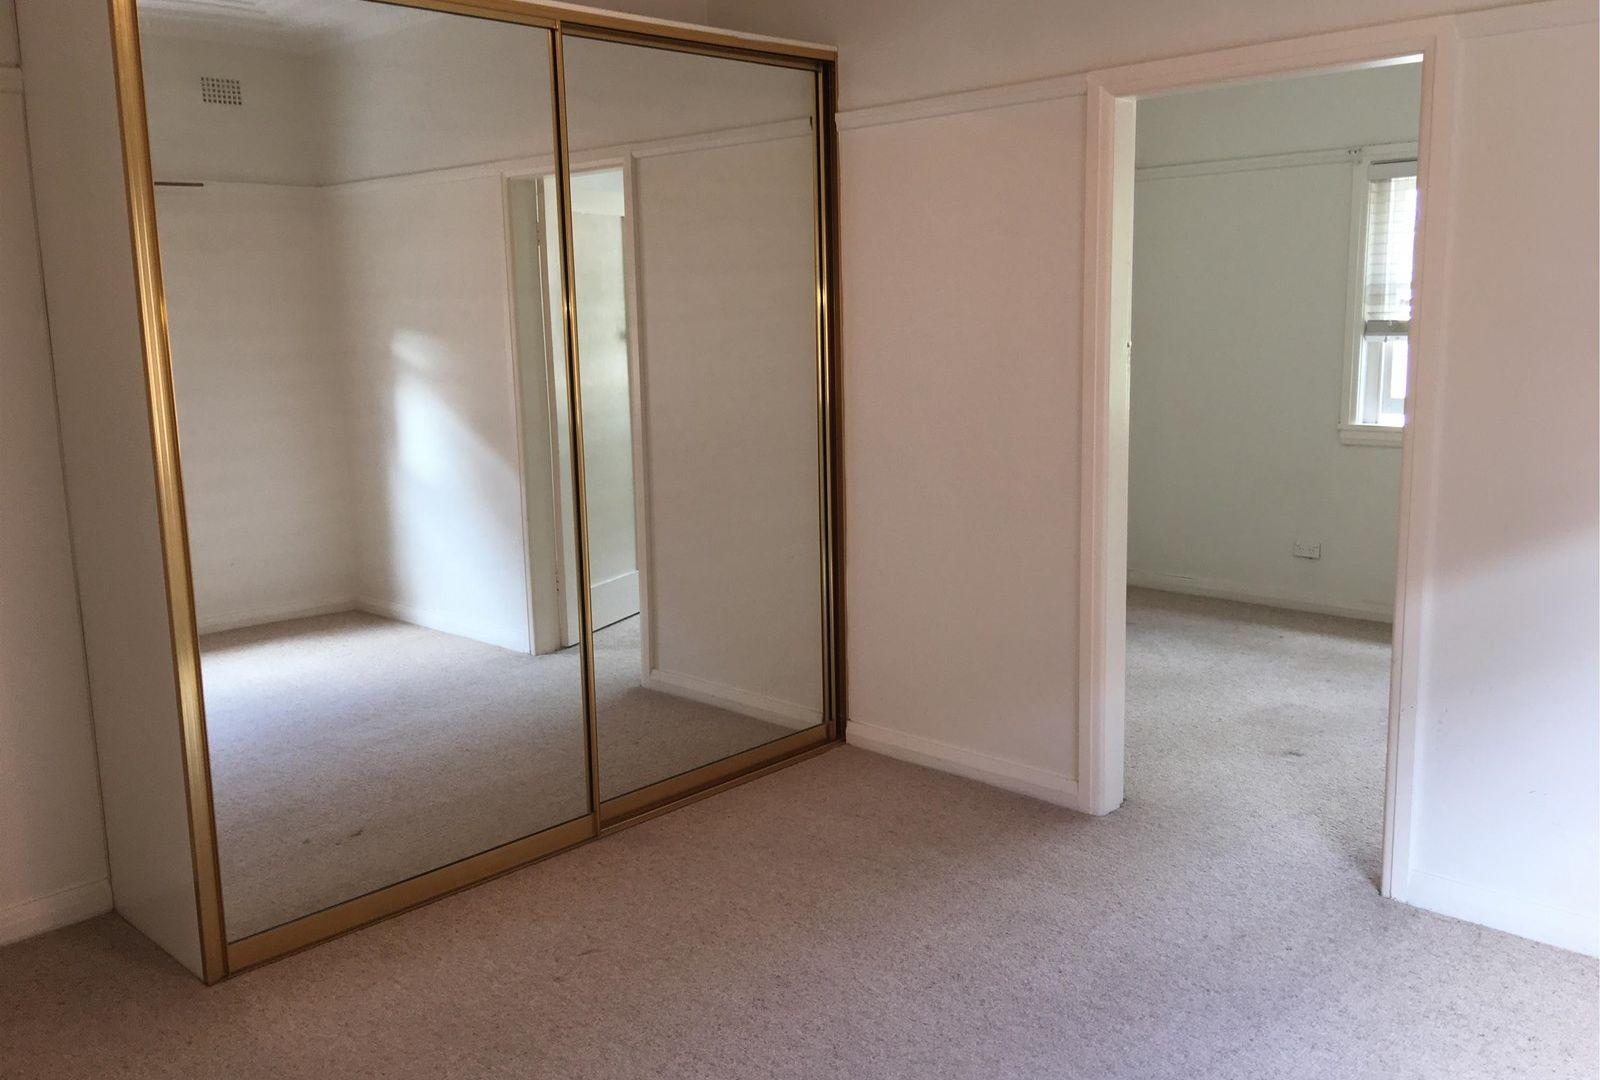 3/221 Condamine Street, Balgowlah NSW 2093, Image 2